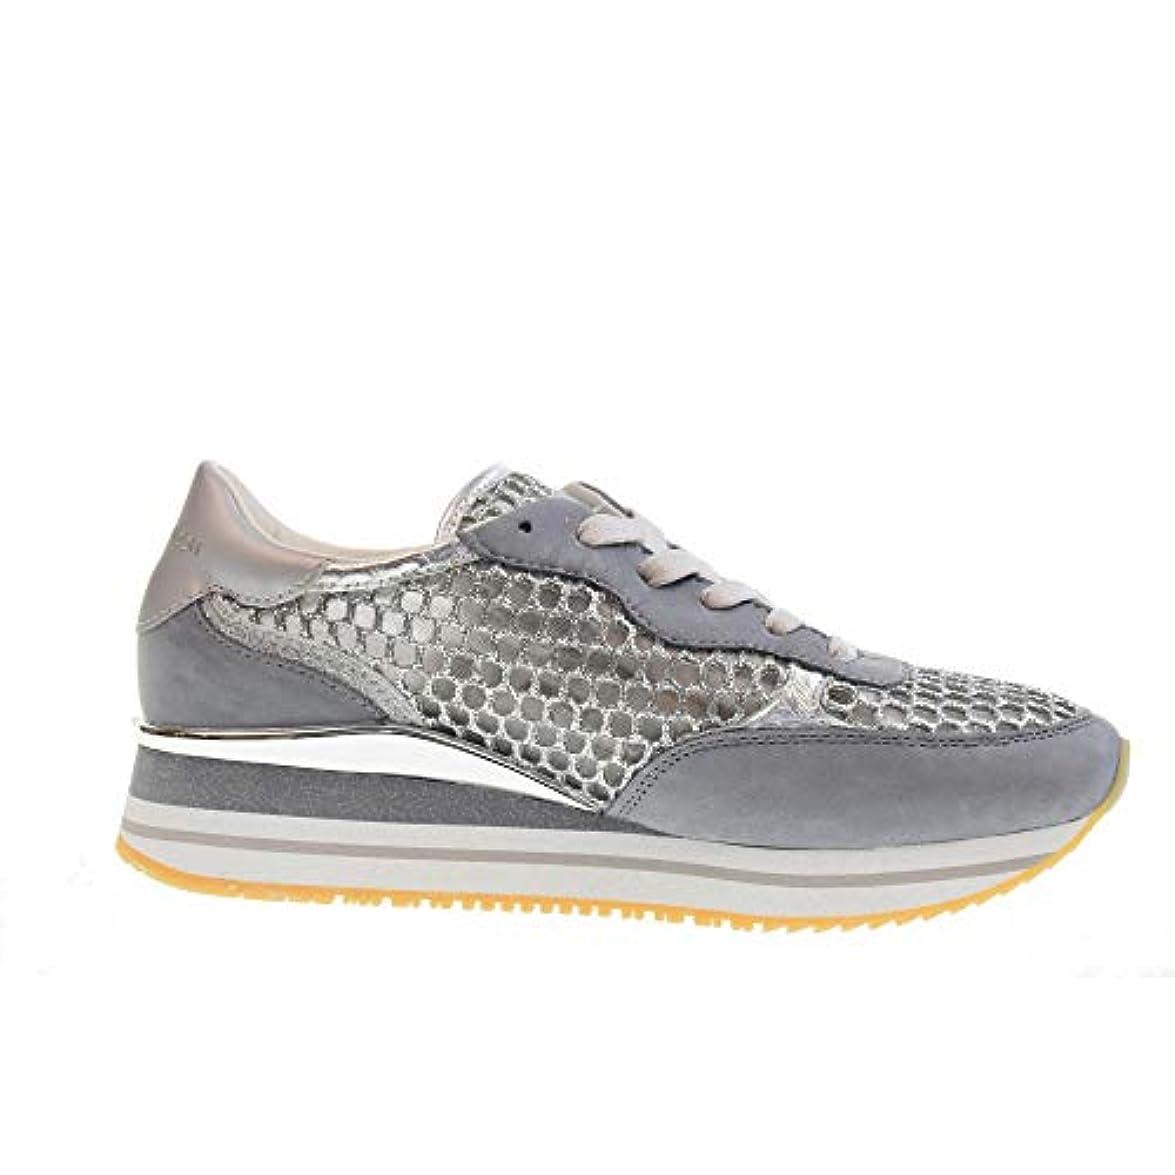 25555pp1 Scarpe Basse Dynamic 25 Sneakers Crime Donna